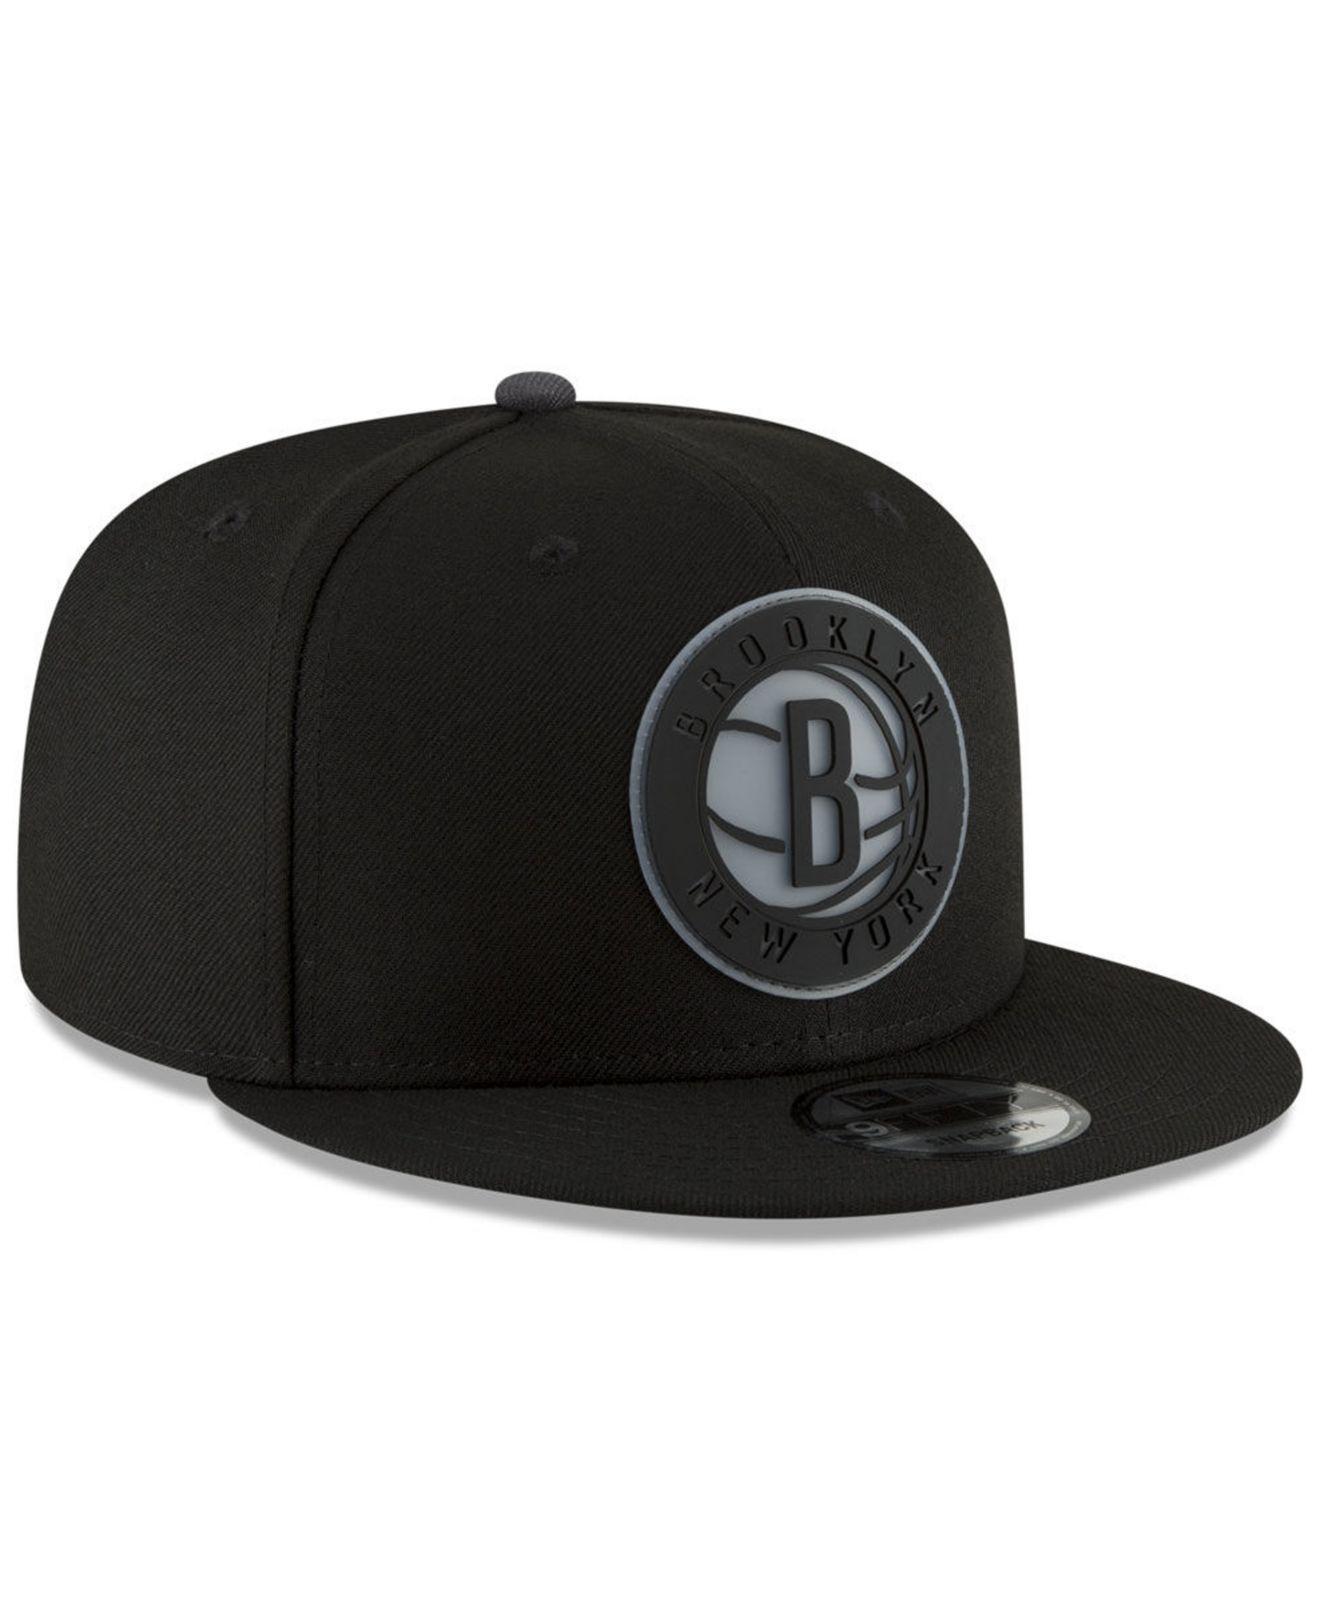 online retailer 96877 8bc9d Lyst - Ktz Brooklyn Nets Team Cleared 9fifty Snapback Cap in Black ...